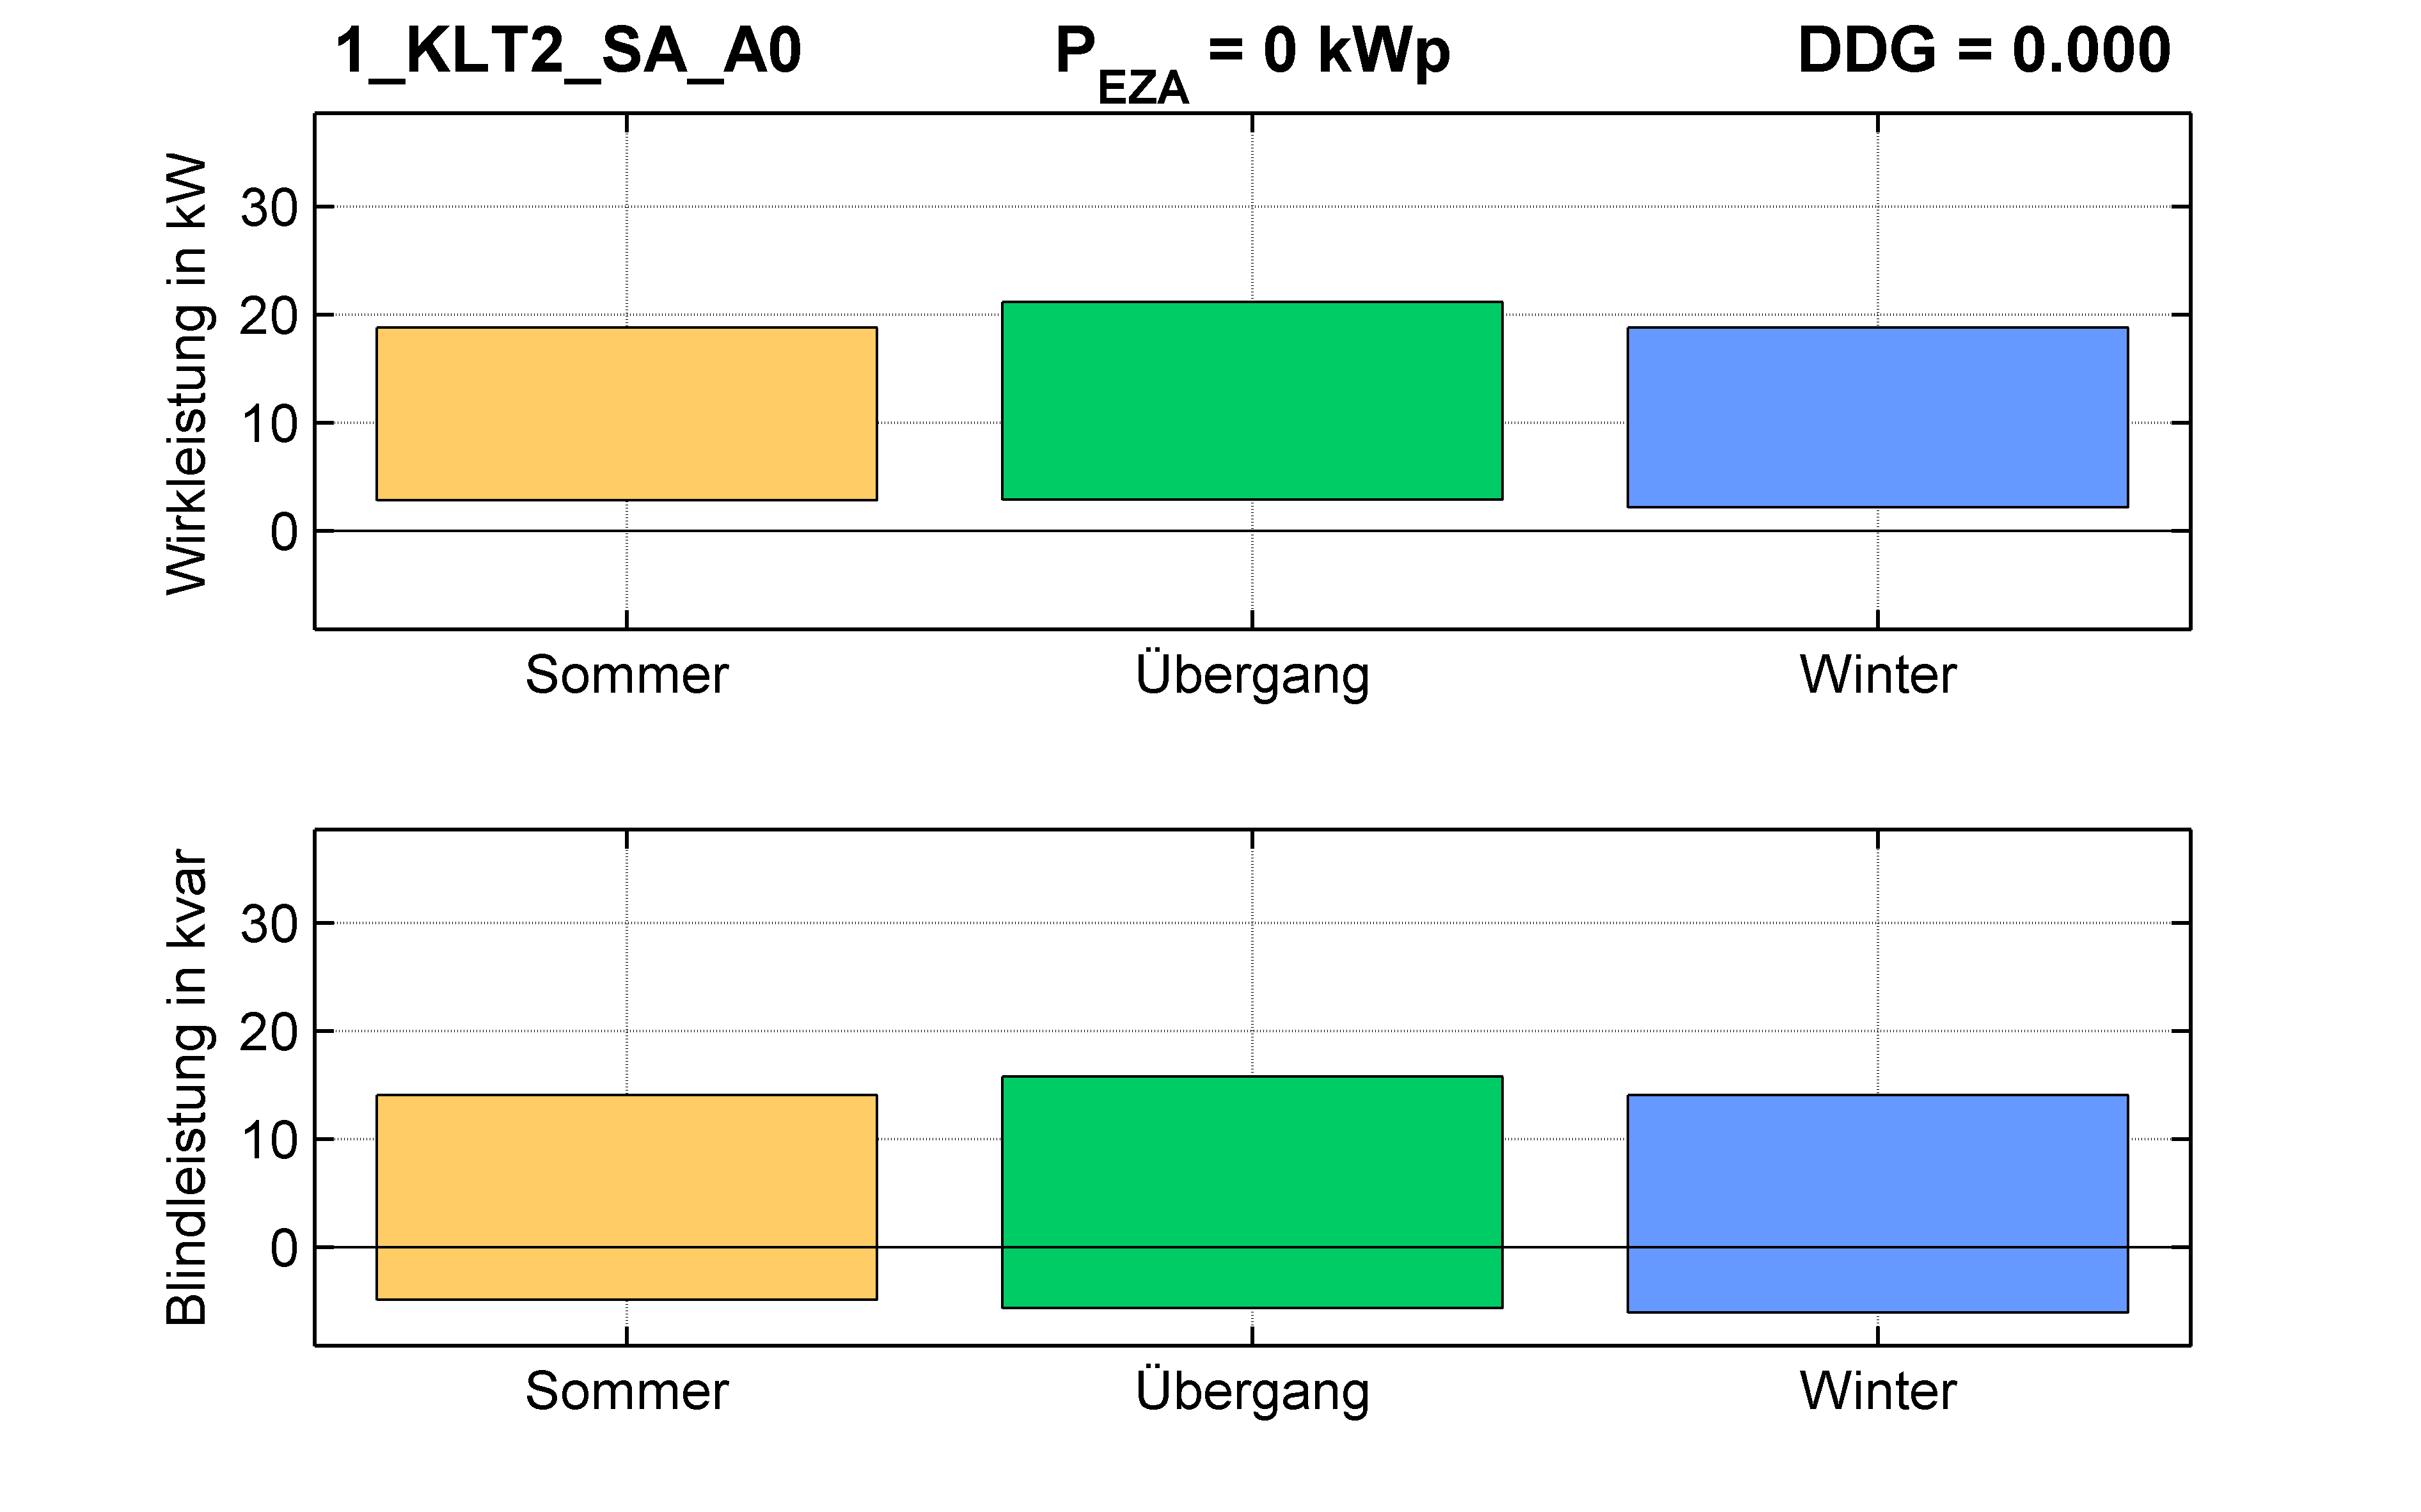 KLT2 | KABEL (SA) A0 | PQ-Bilanz